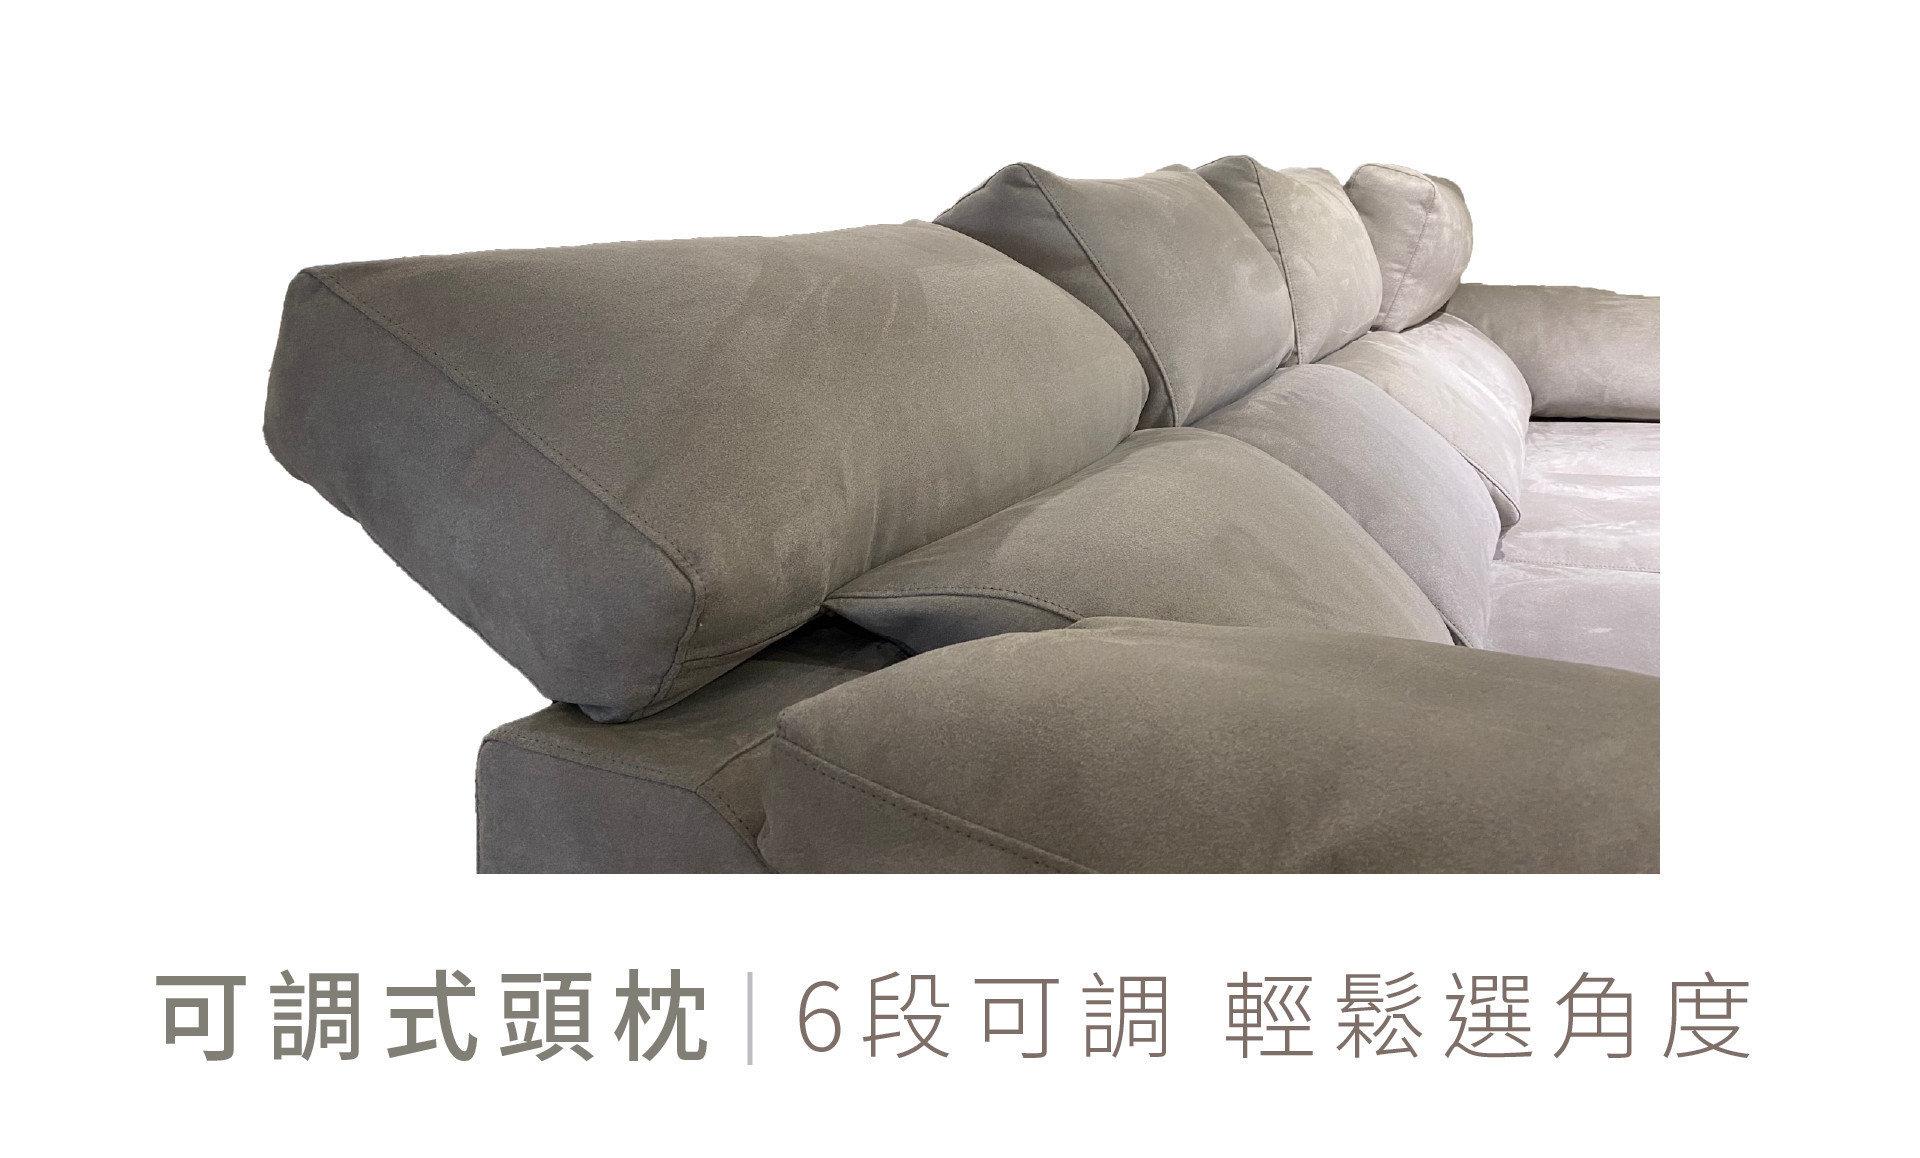 LONG LEGS 長腿叔叔沙發特色:六段可調式頭枕,隨您喜歡